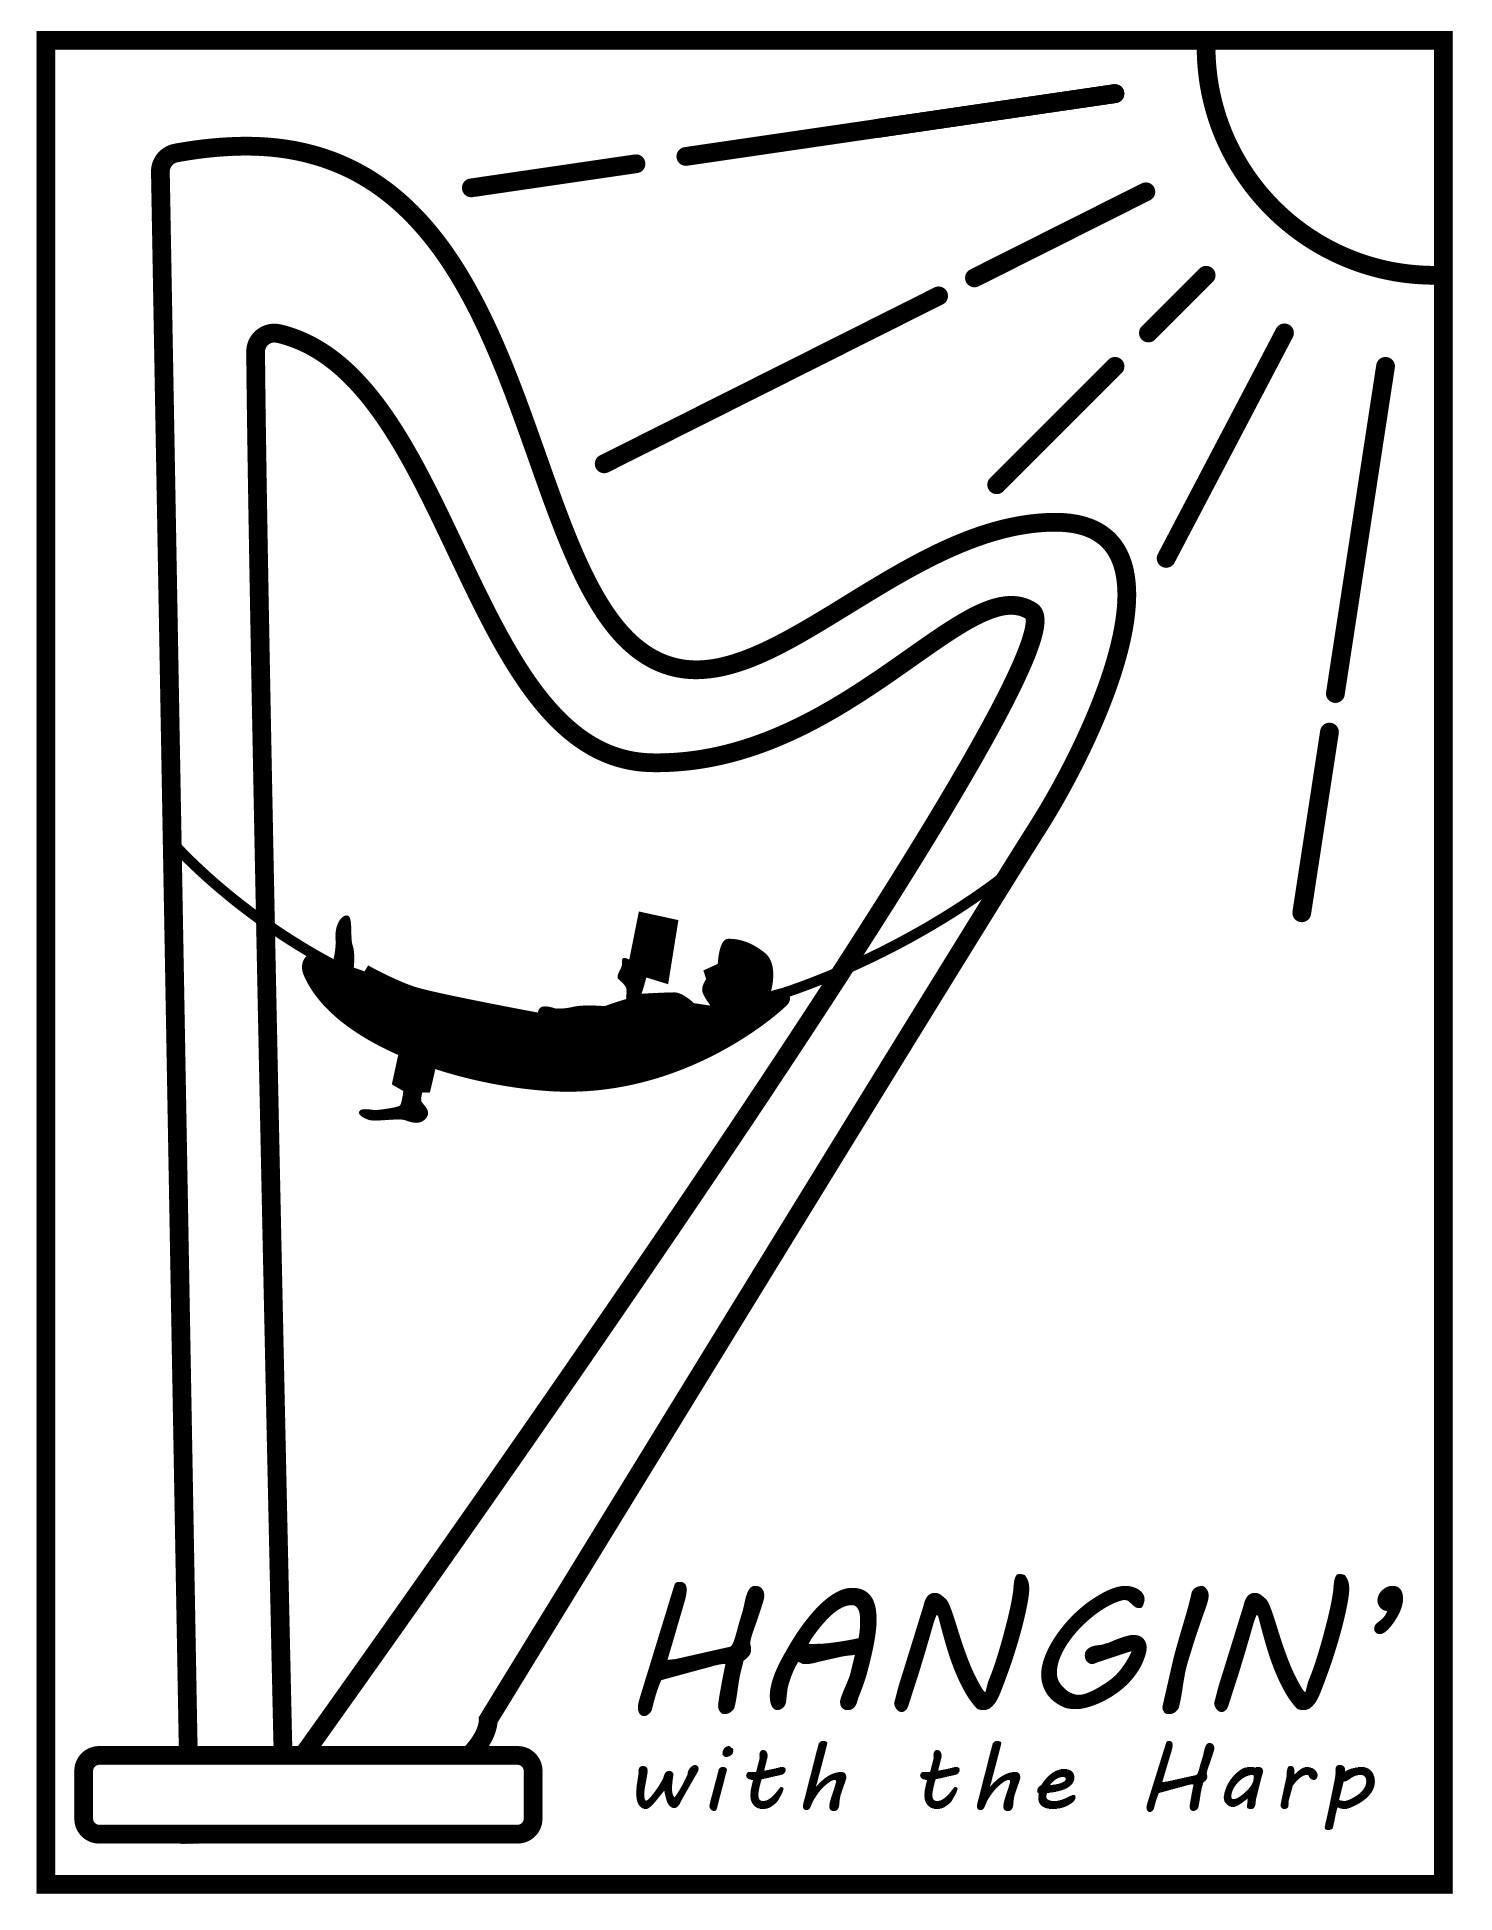 hangin-logo.jpg